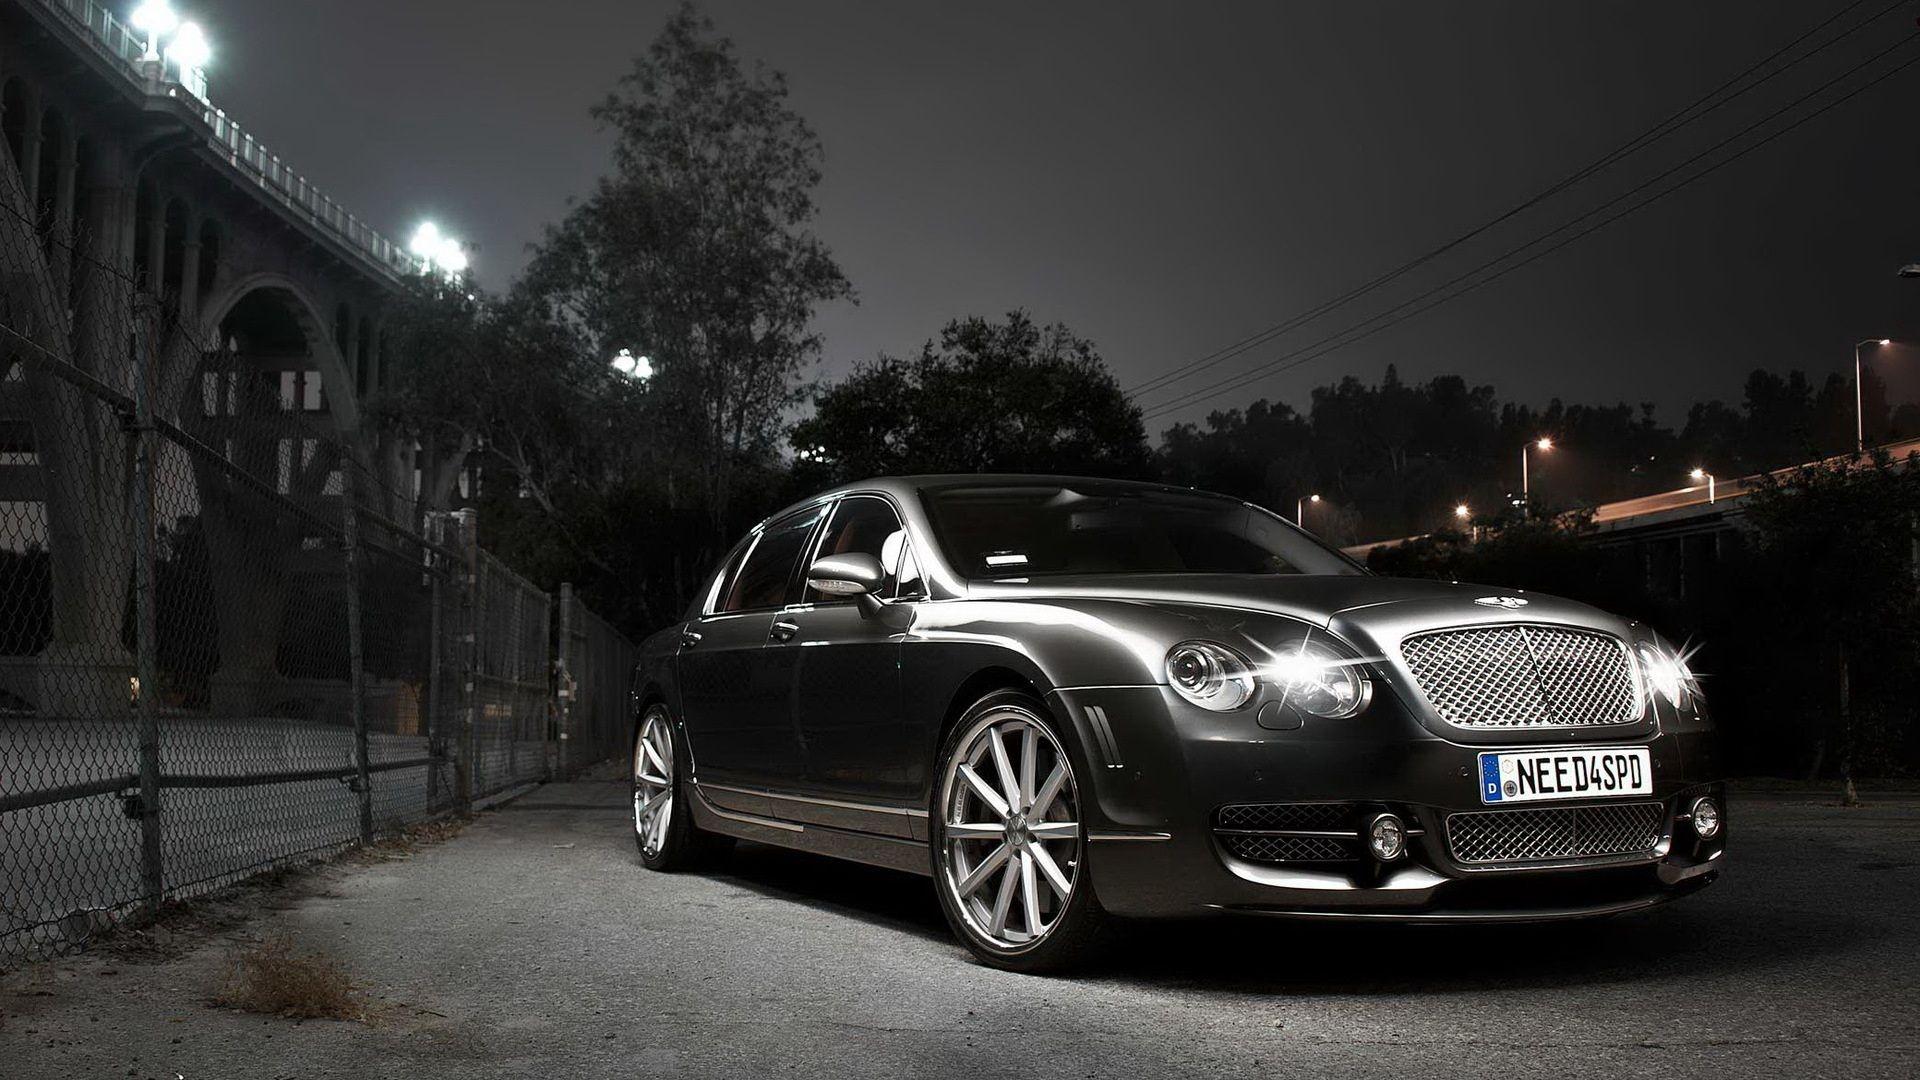 so nice black car image